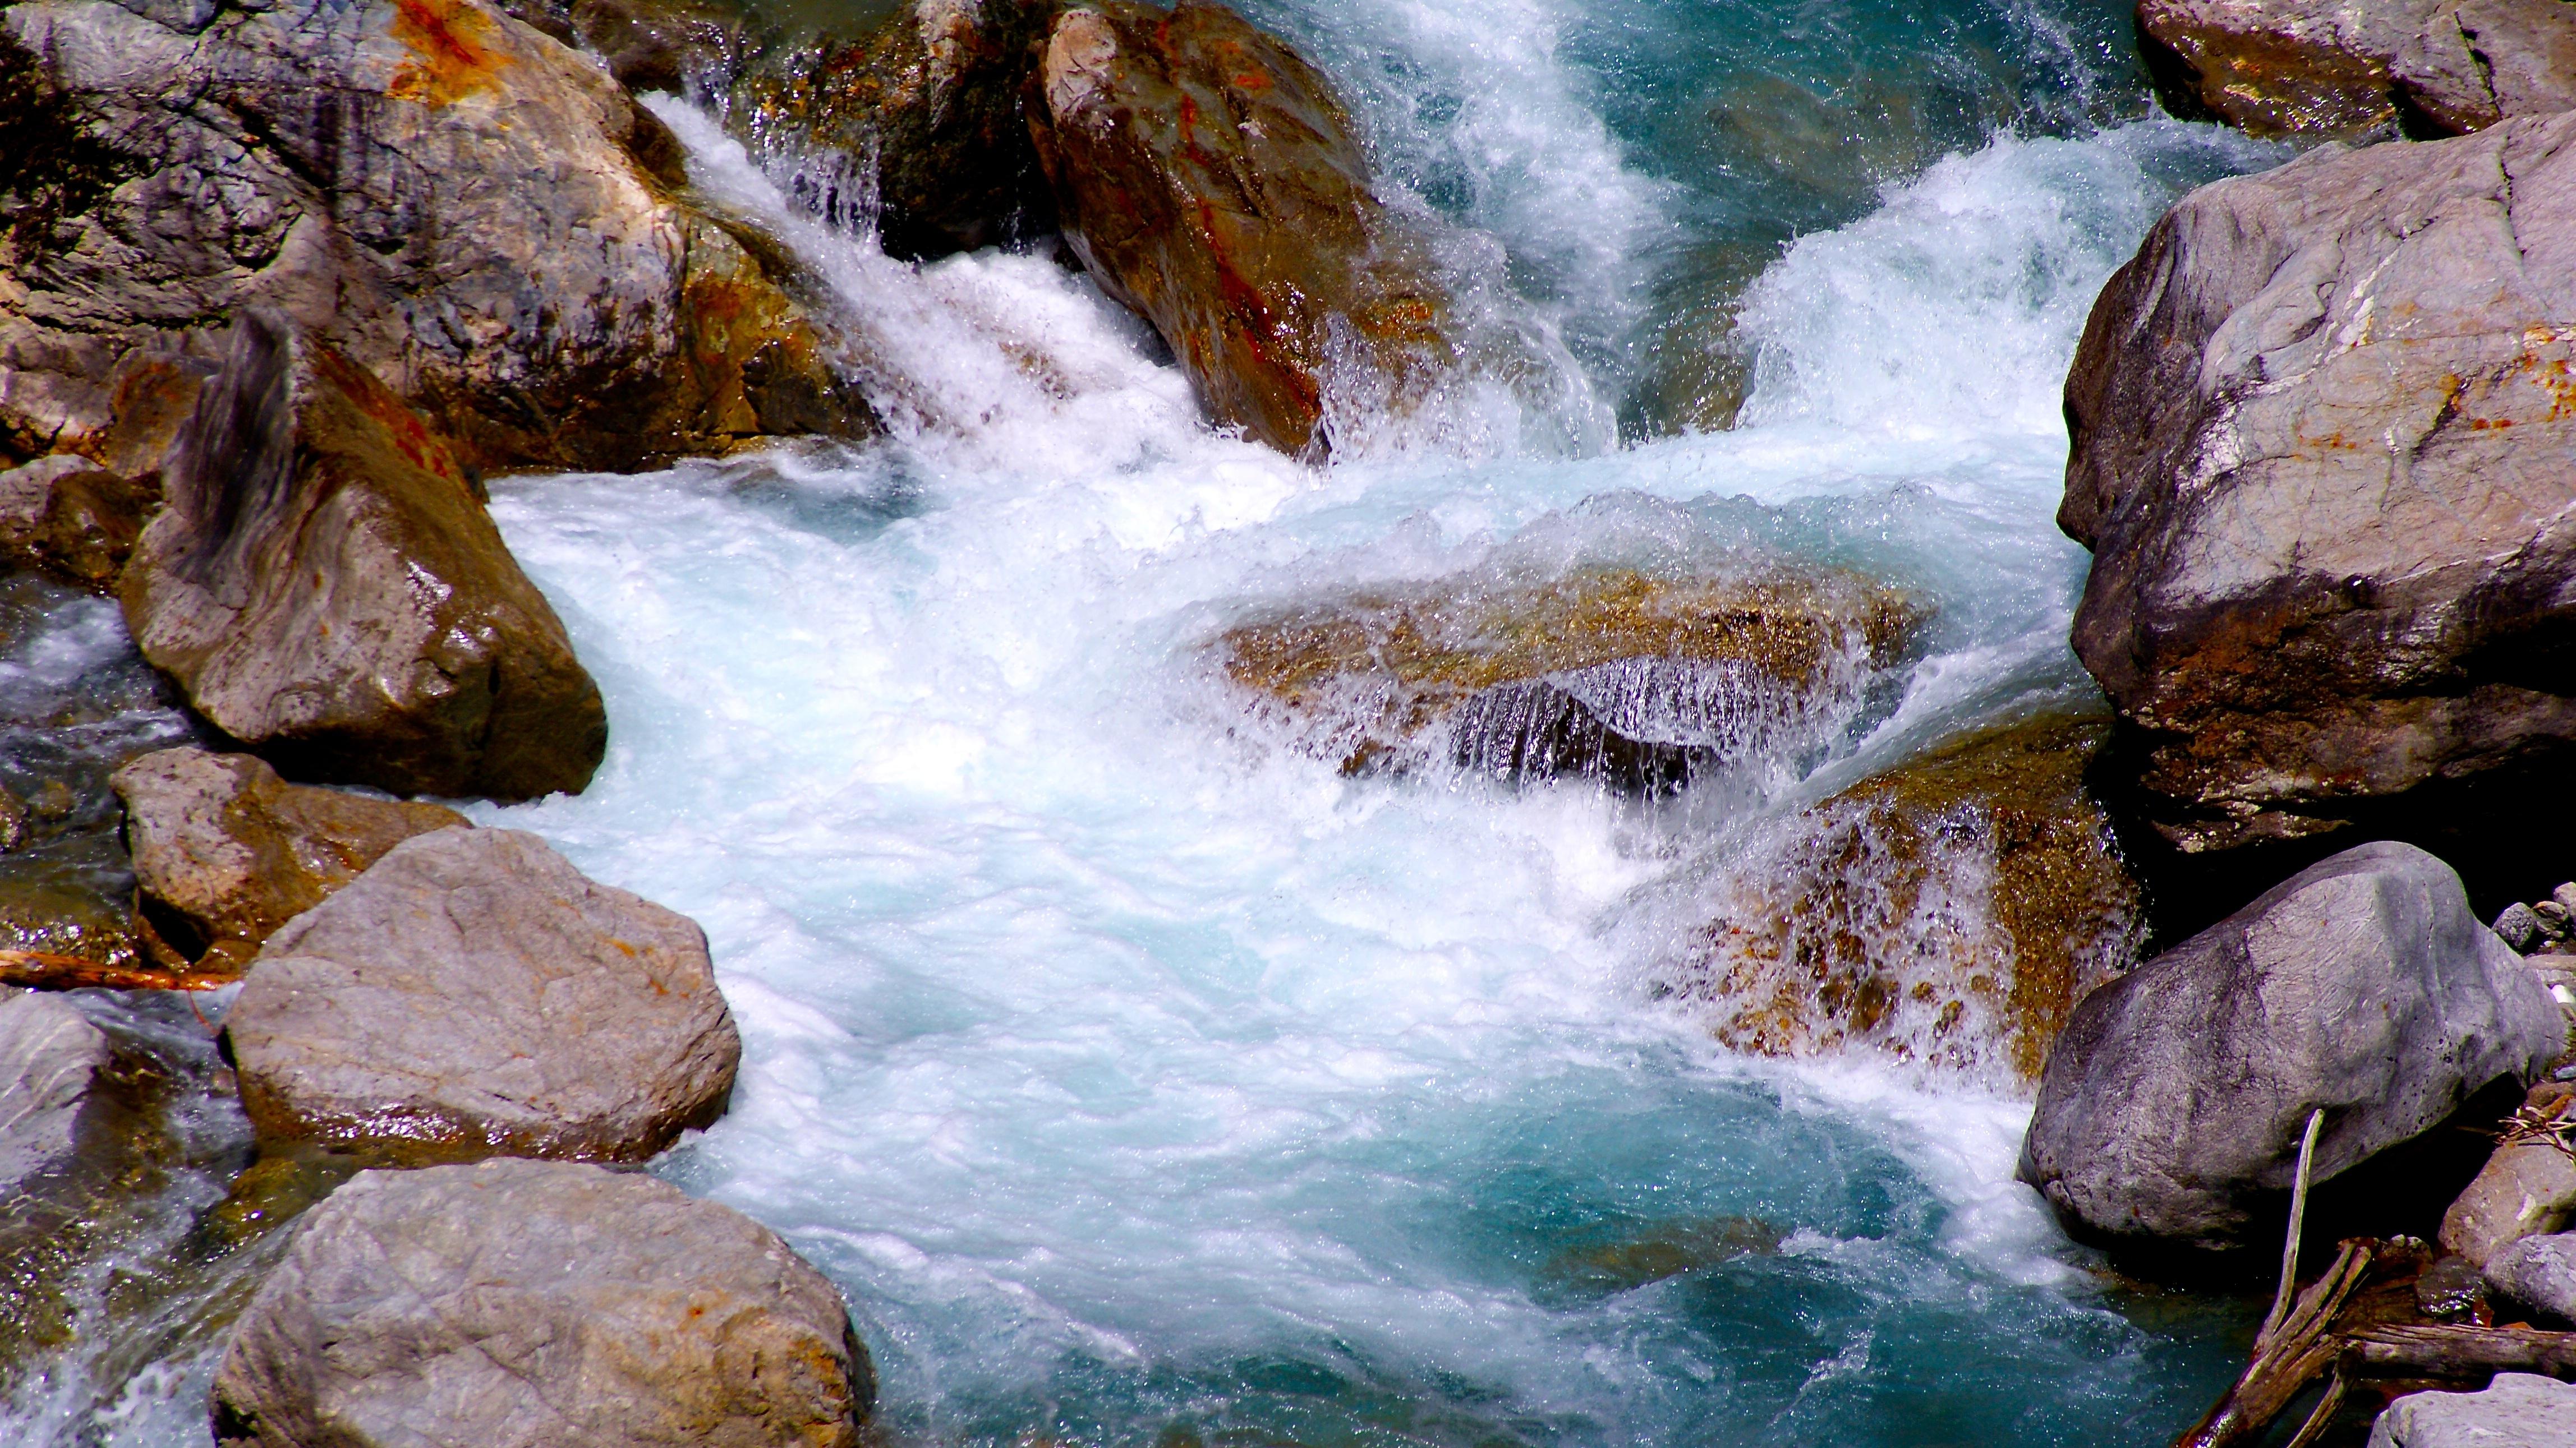 Free Images : landscape, sea, nature, rock, waterfall, creek